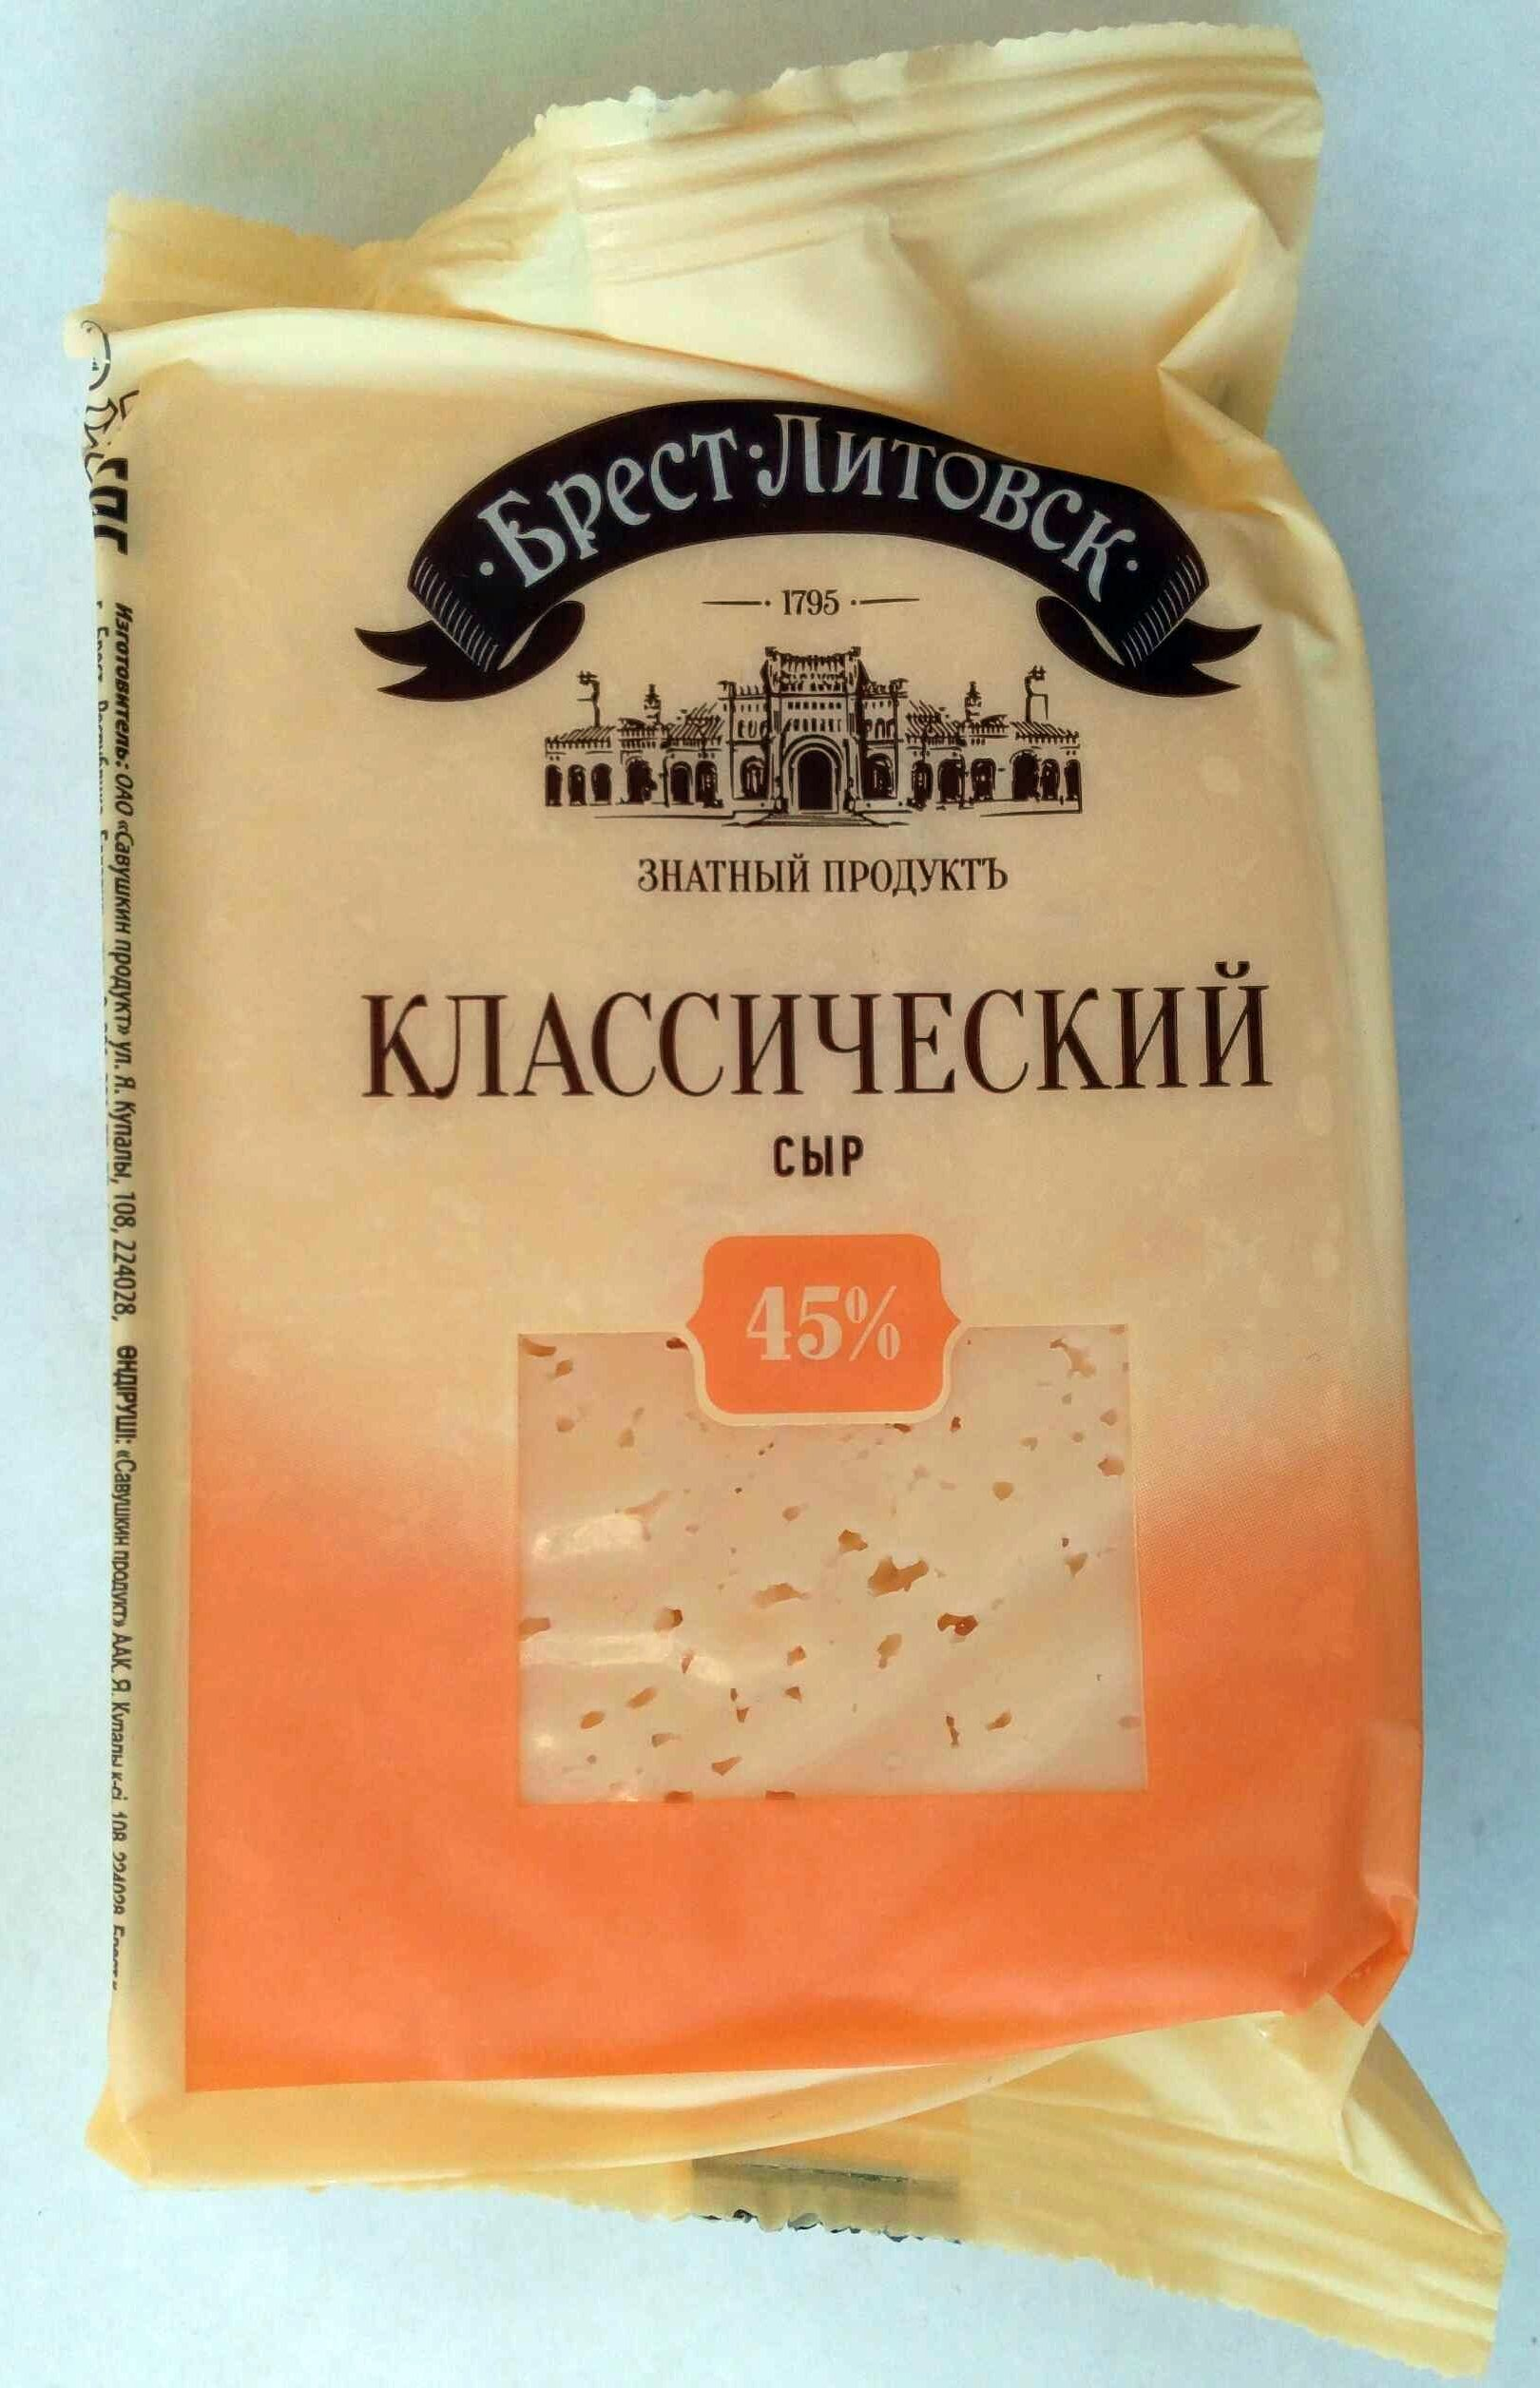 Сыр Классический - Product - ru